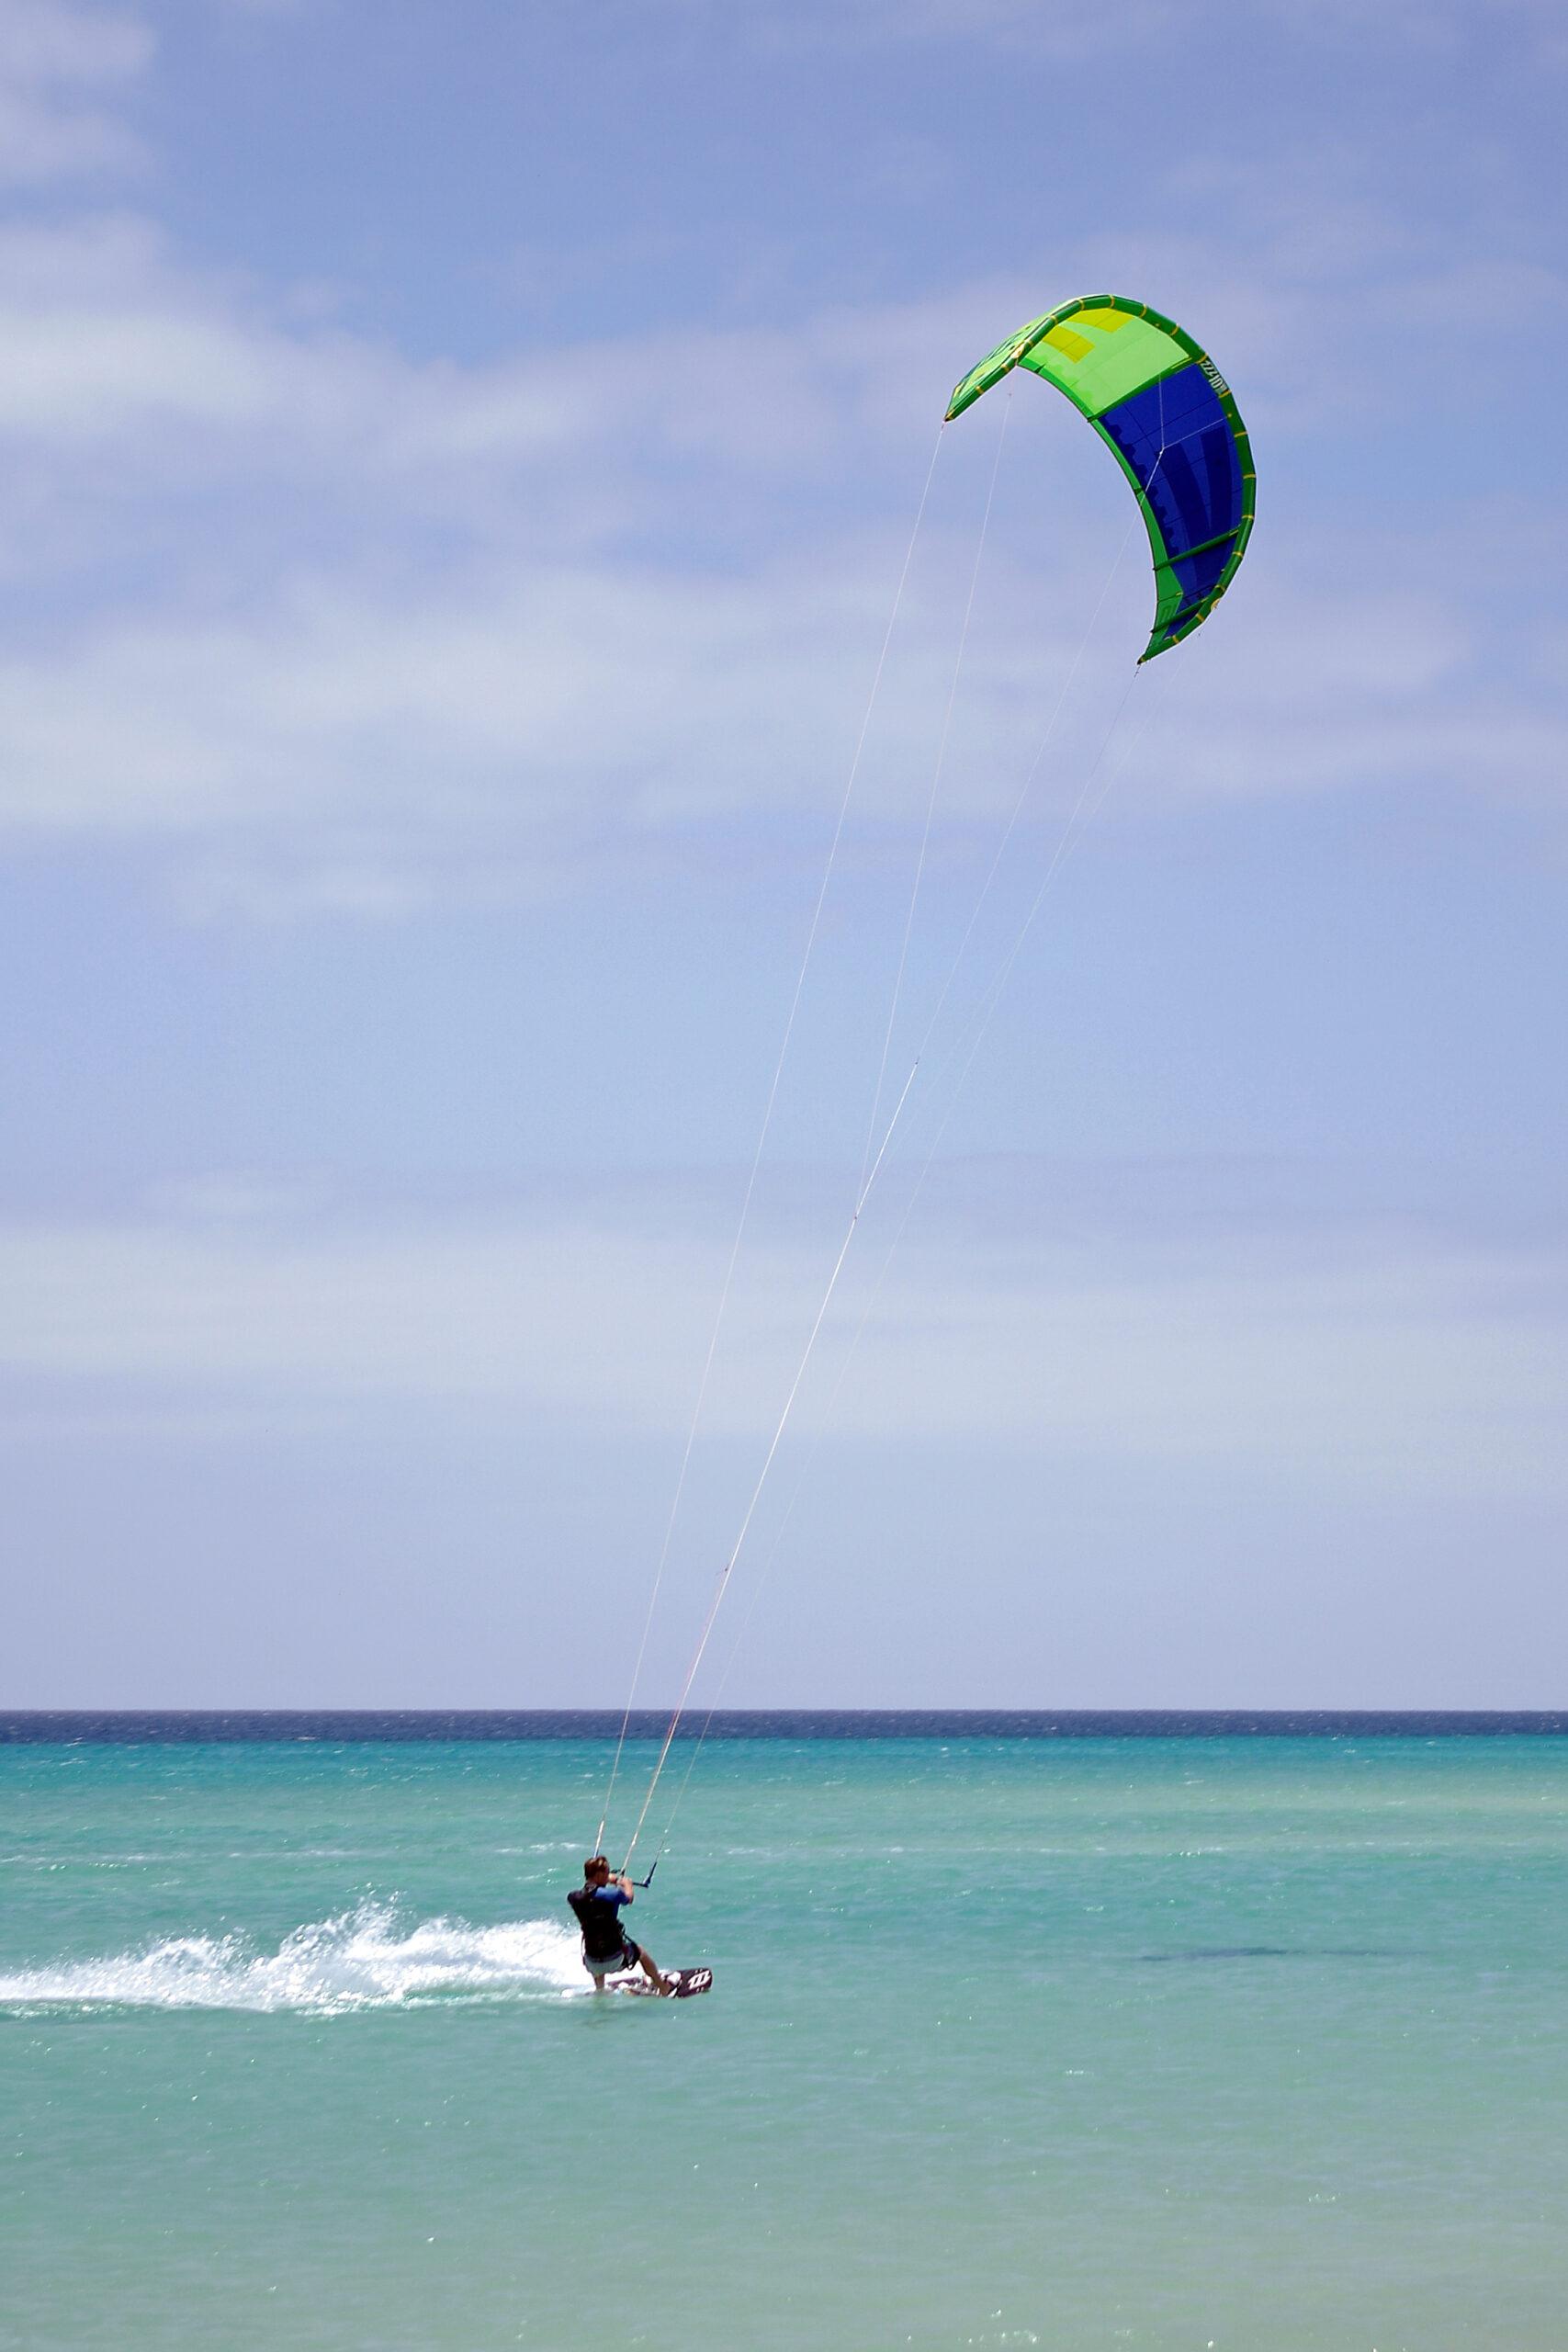 trip to kiteboard|kiteboarding travel planner app